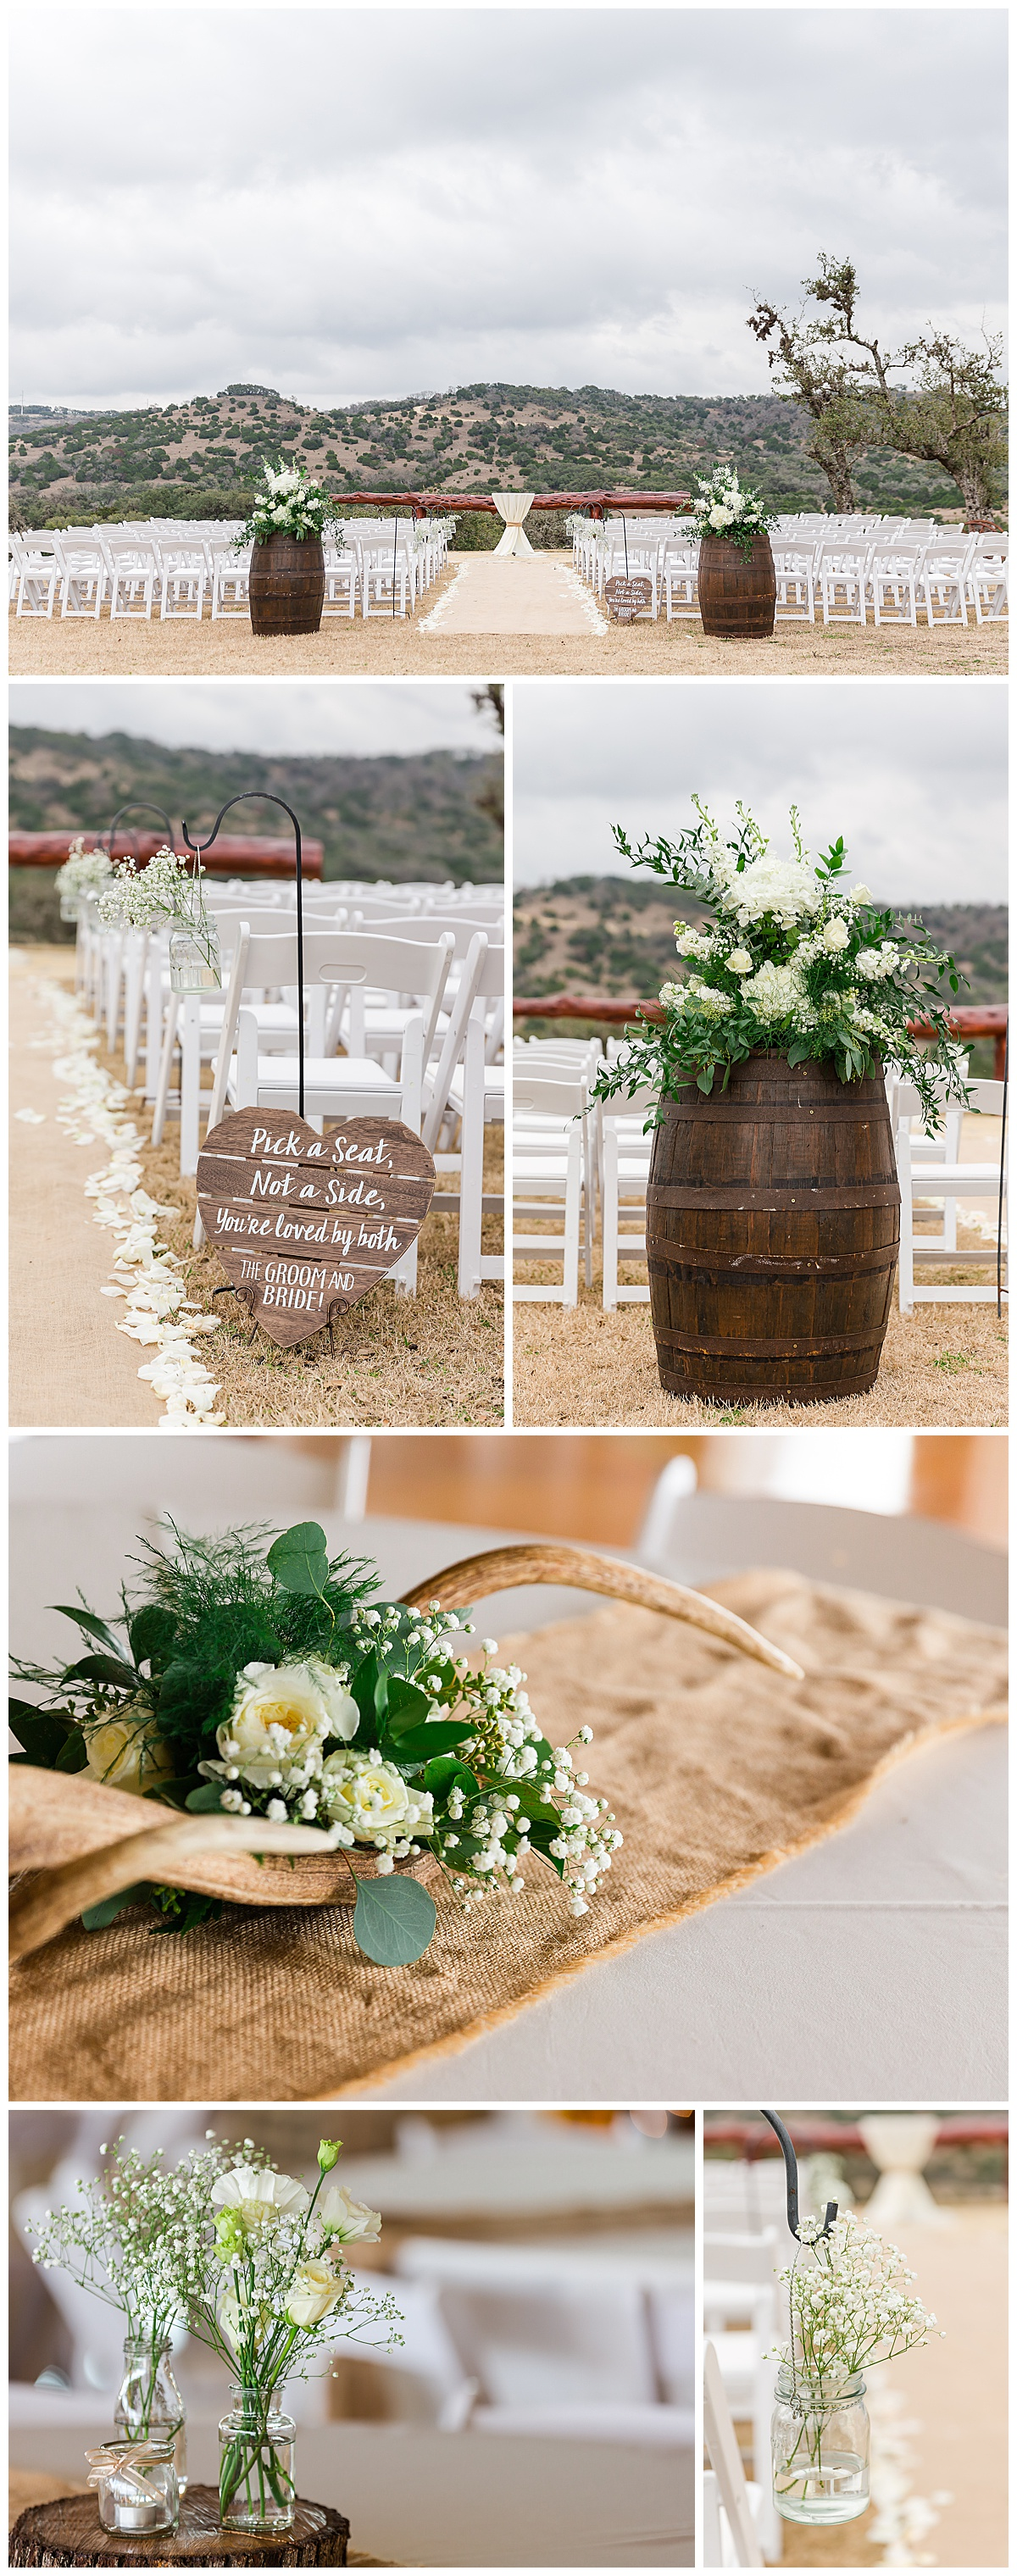 Wedding-Photographer-Texas-Hill-Country-Happy-H-Ranch-Comfor-Texas-Carly-Barton-Photography_0005.jpg